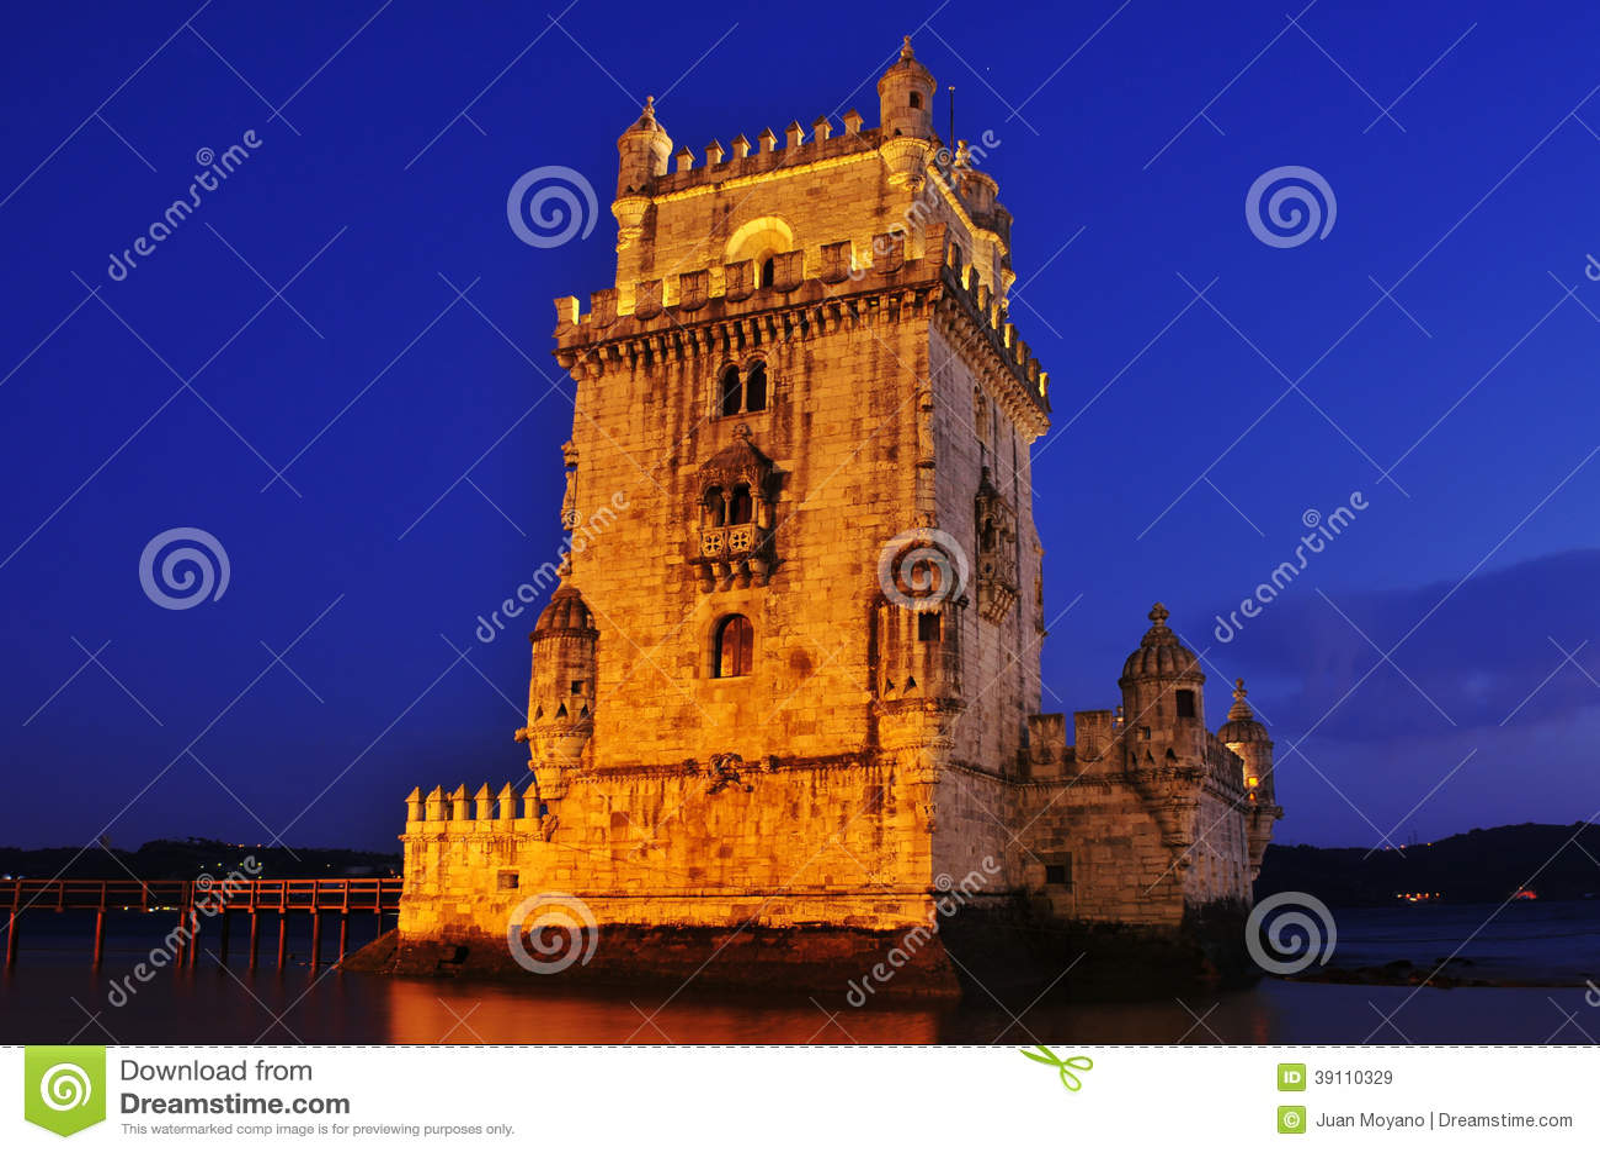 De Toren van Belem in Lissabon, Portugal